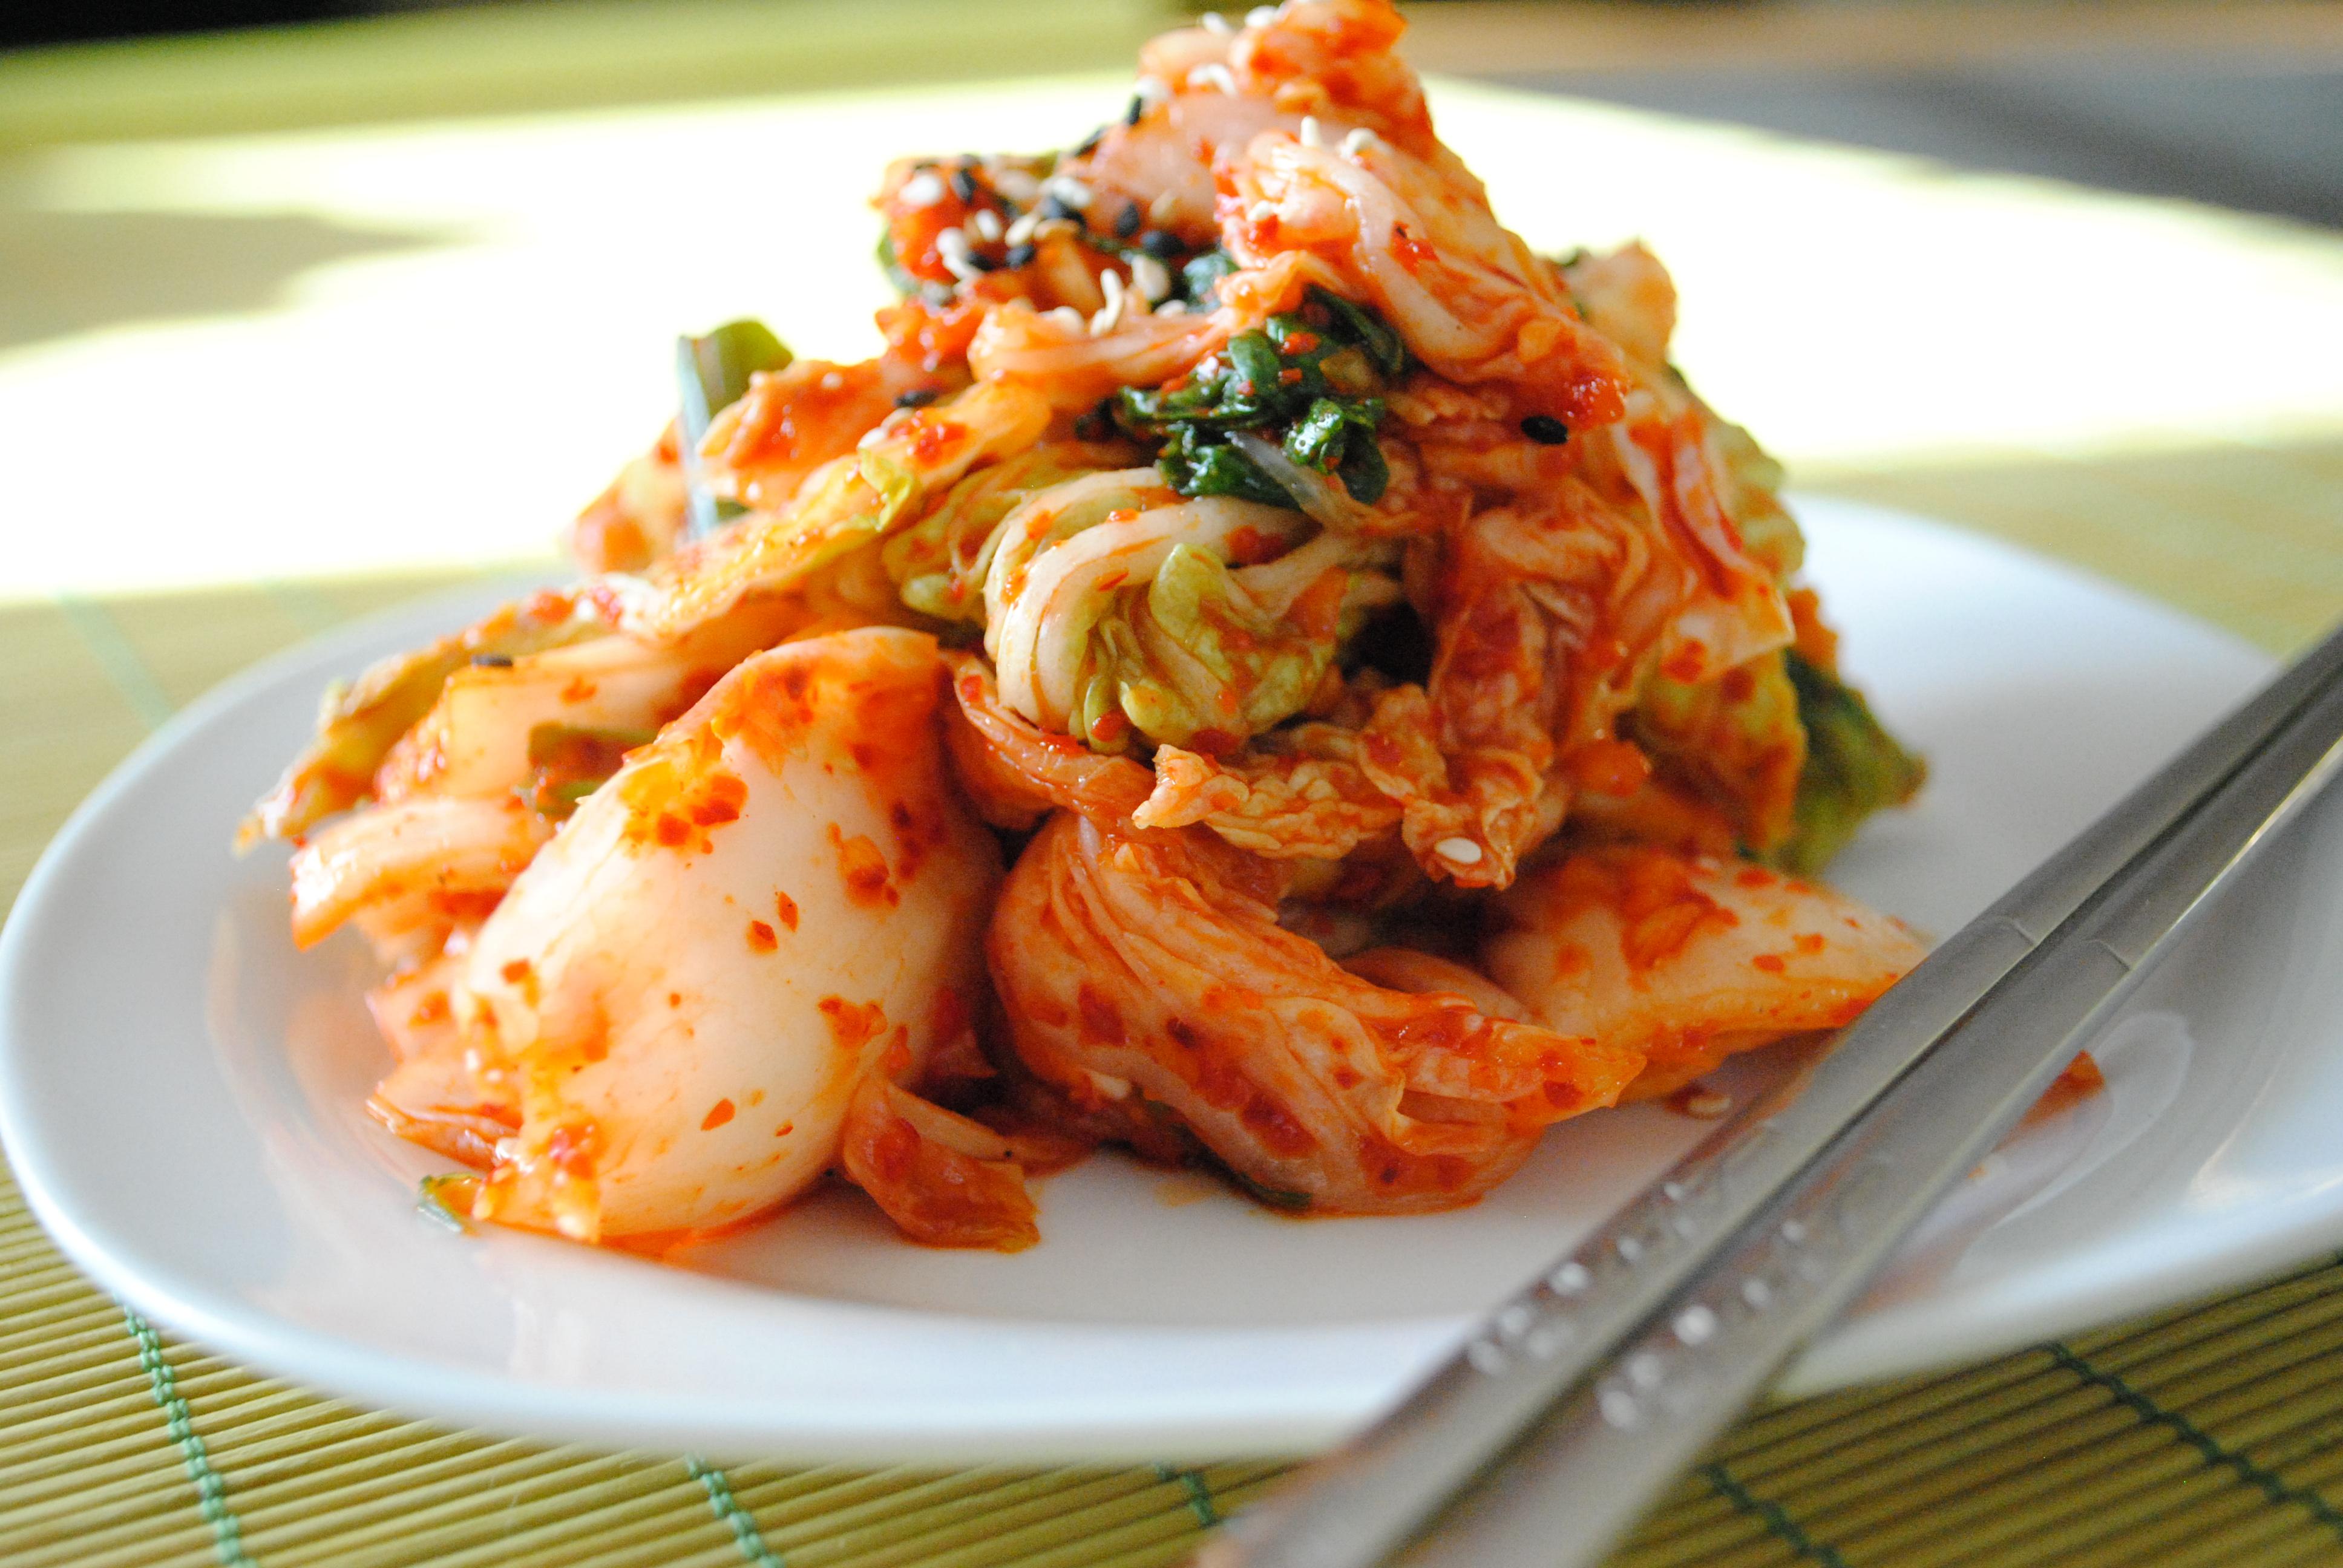 Кимчи — что это такое, рецепт кимчи по-корейски кимчи — что это такое, рецепт кимчи по-корейски